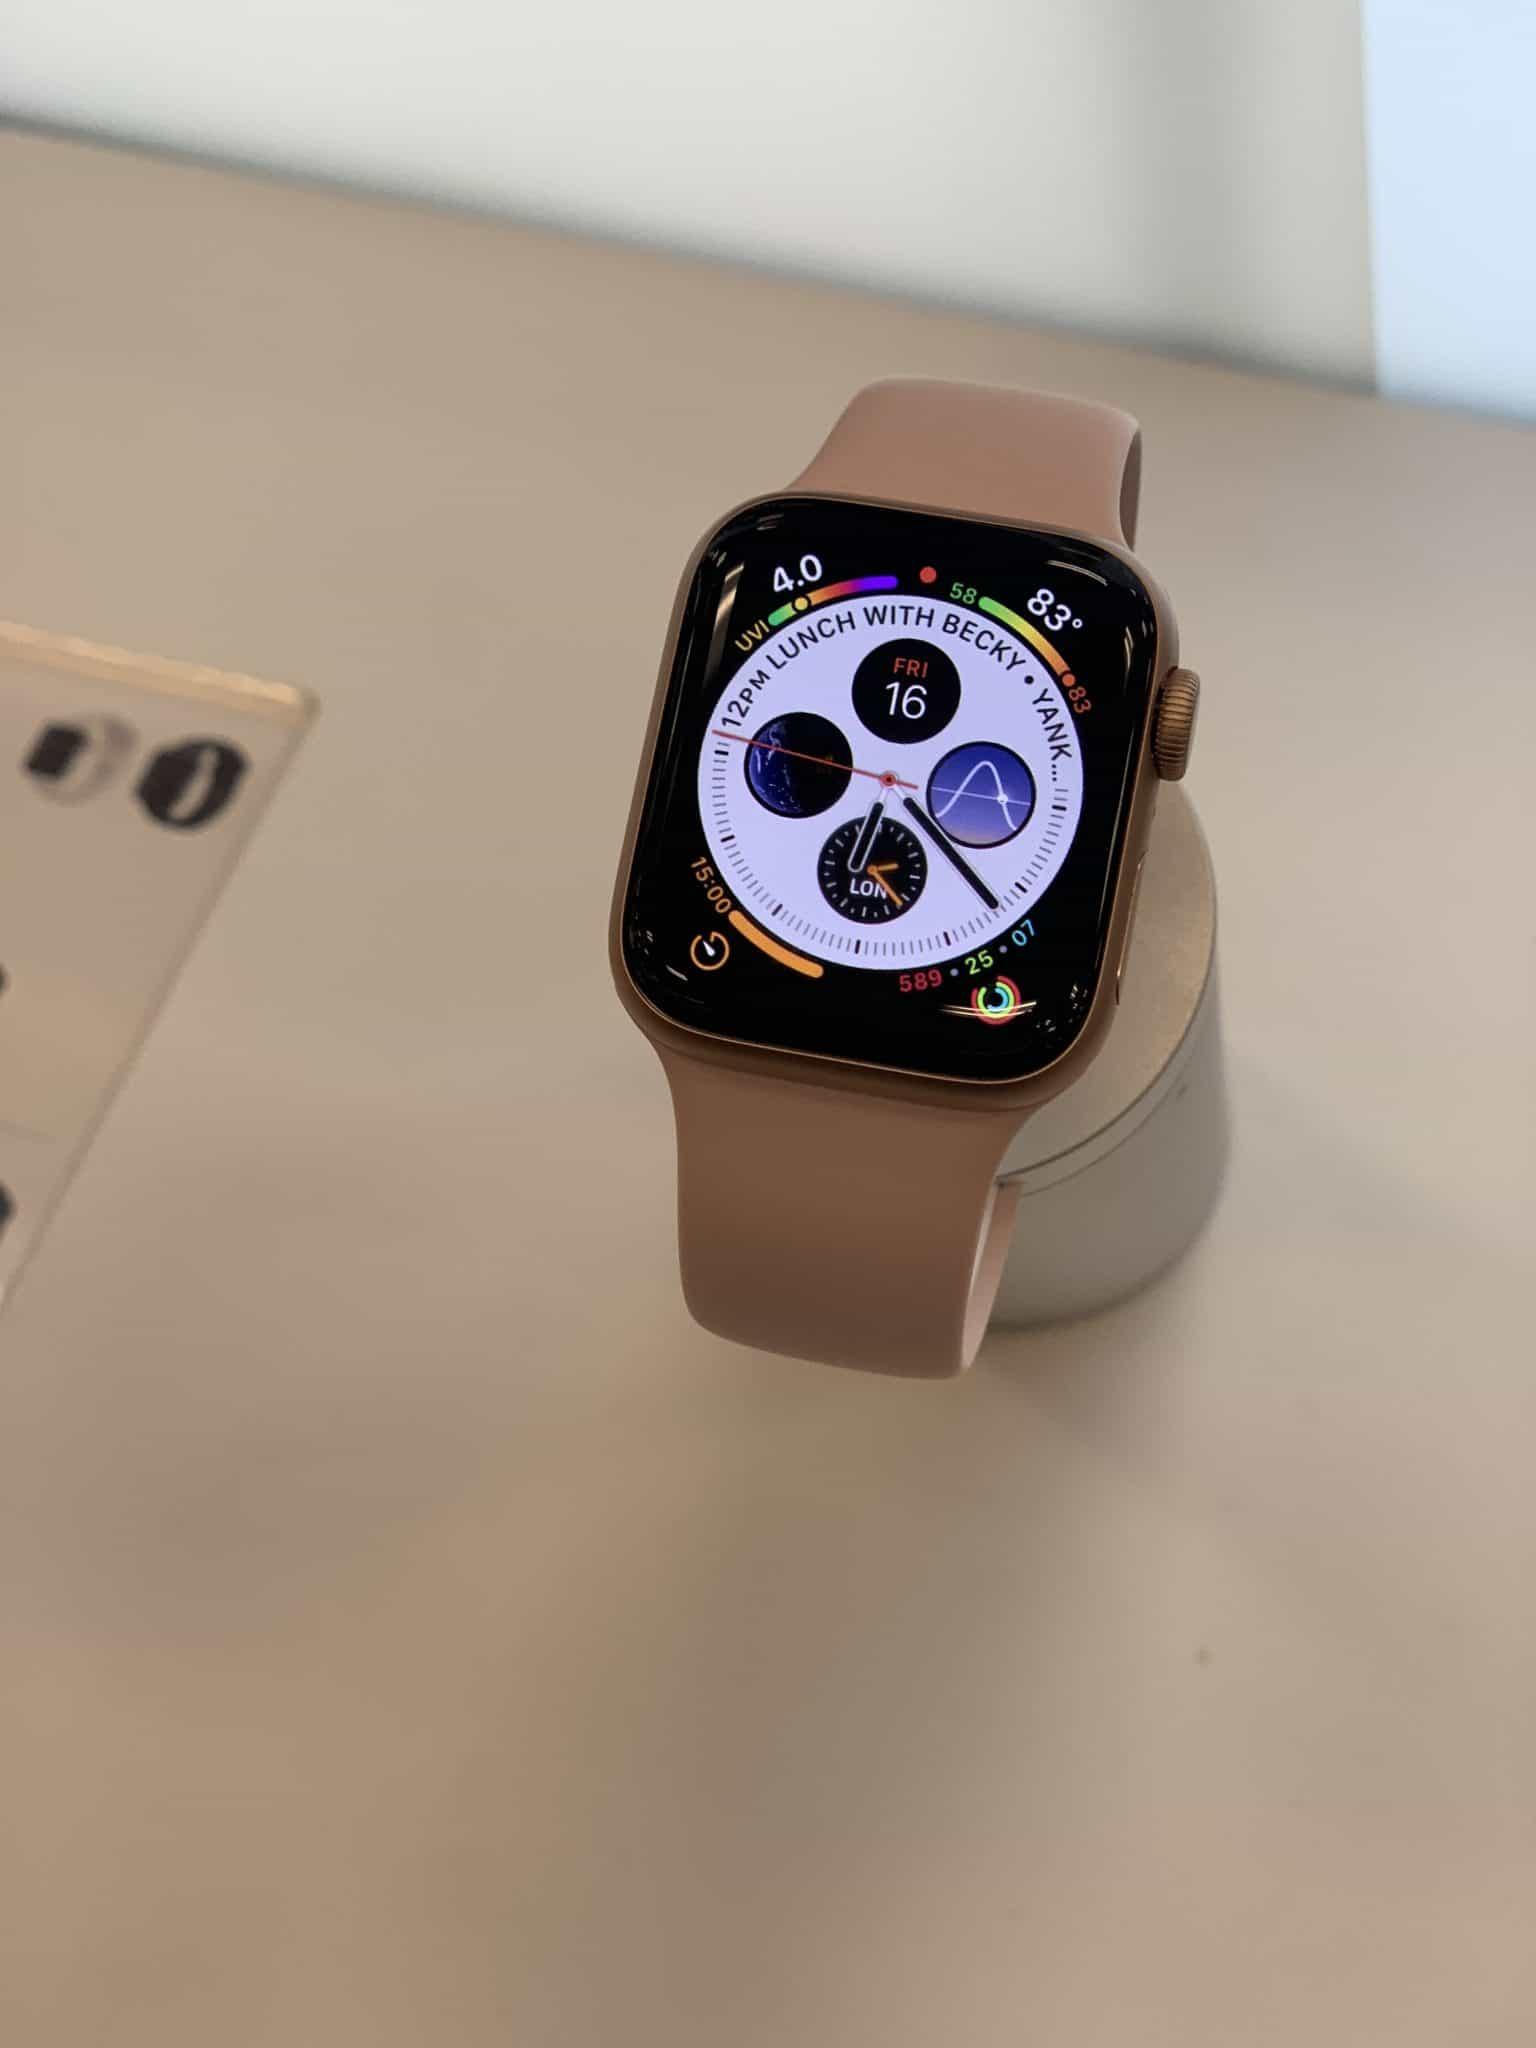 Apple Watch 3 Black Friday